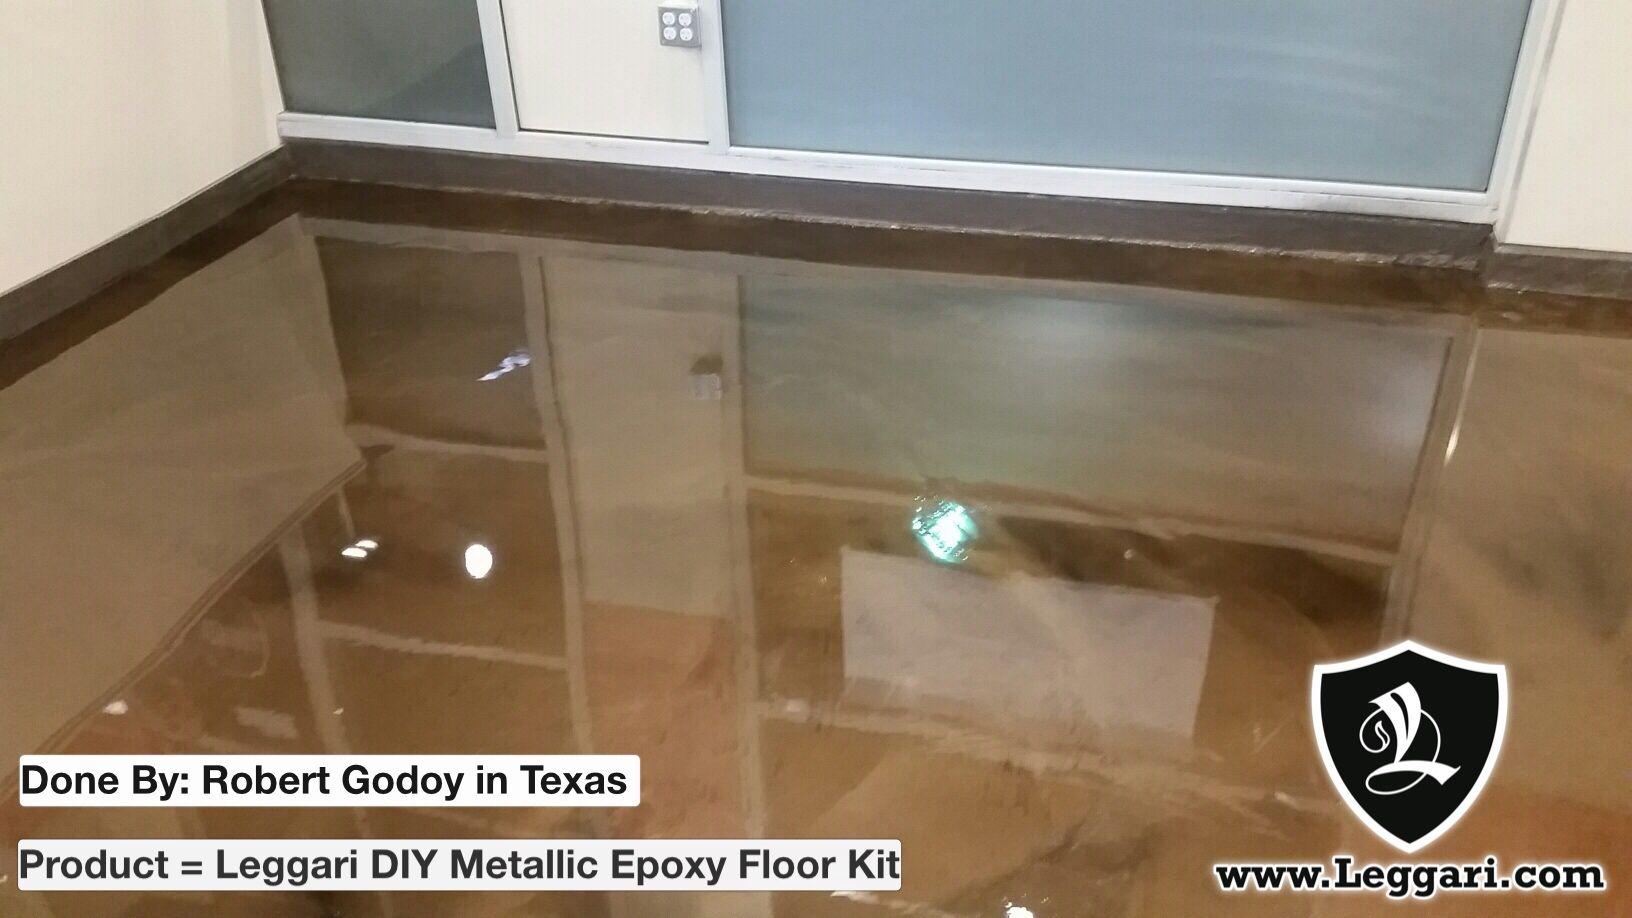 This epoxy floor looks great. Nice job Robert! DIY